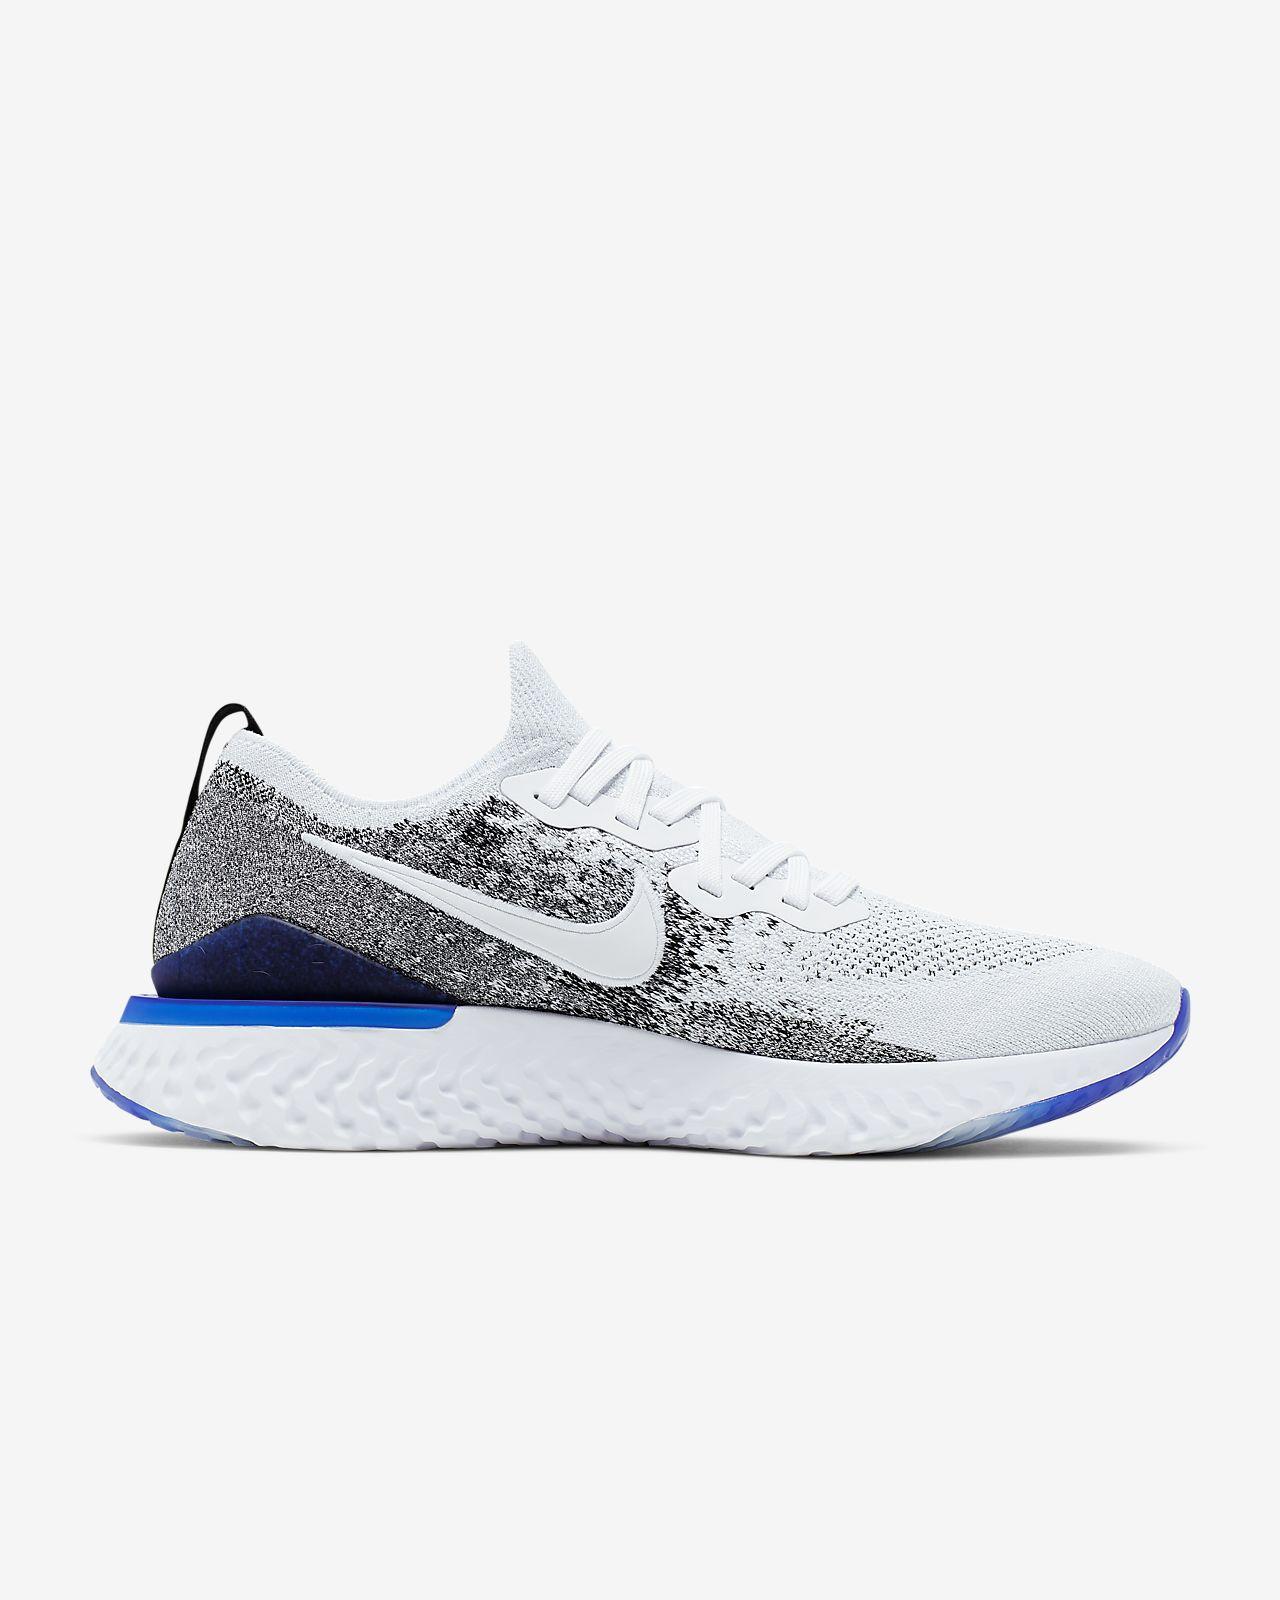 official photos d6efb 94b0a Nike Epic React Flyknit 2 Men's Running Shoe